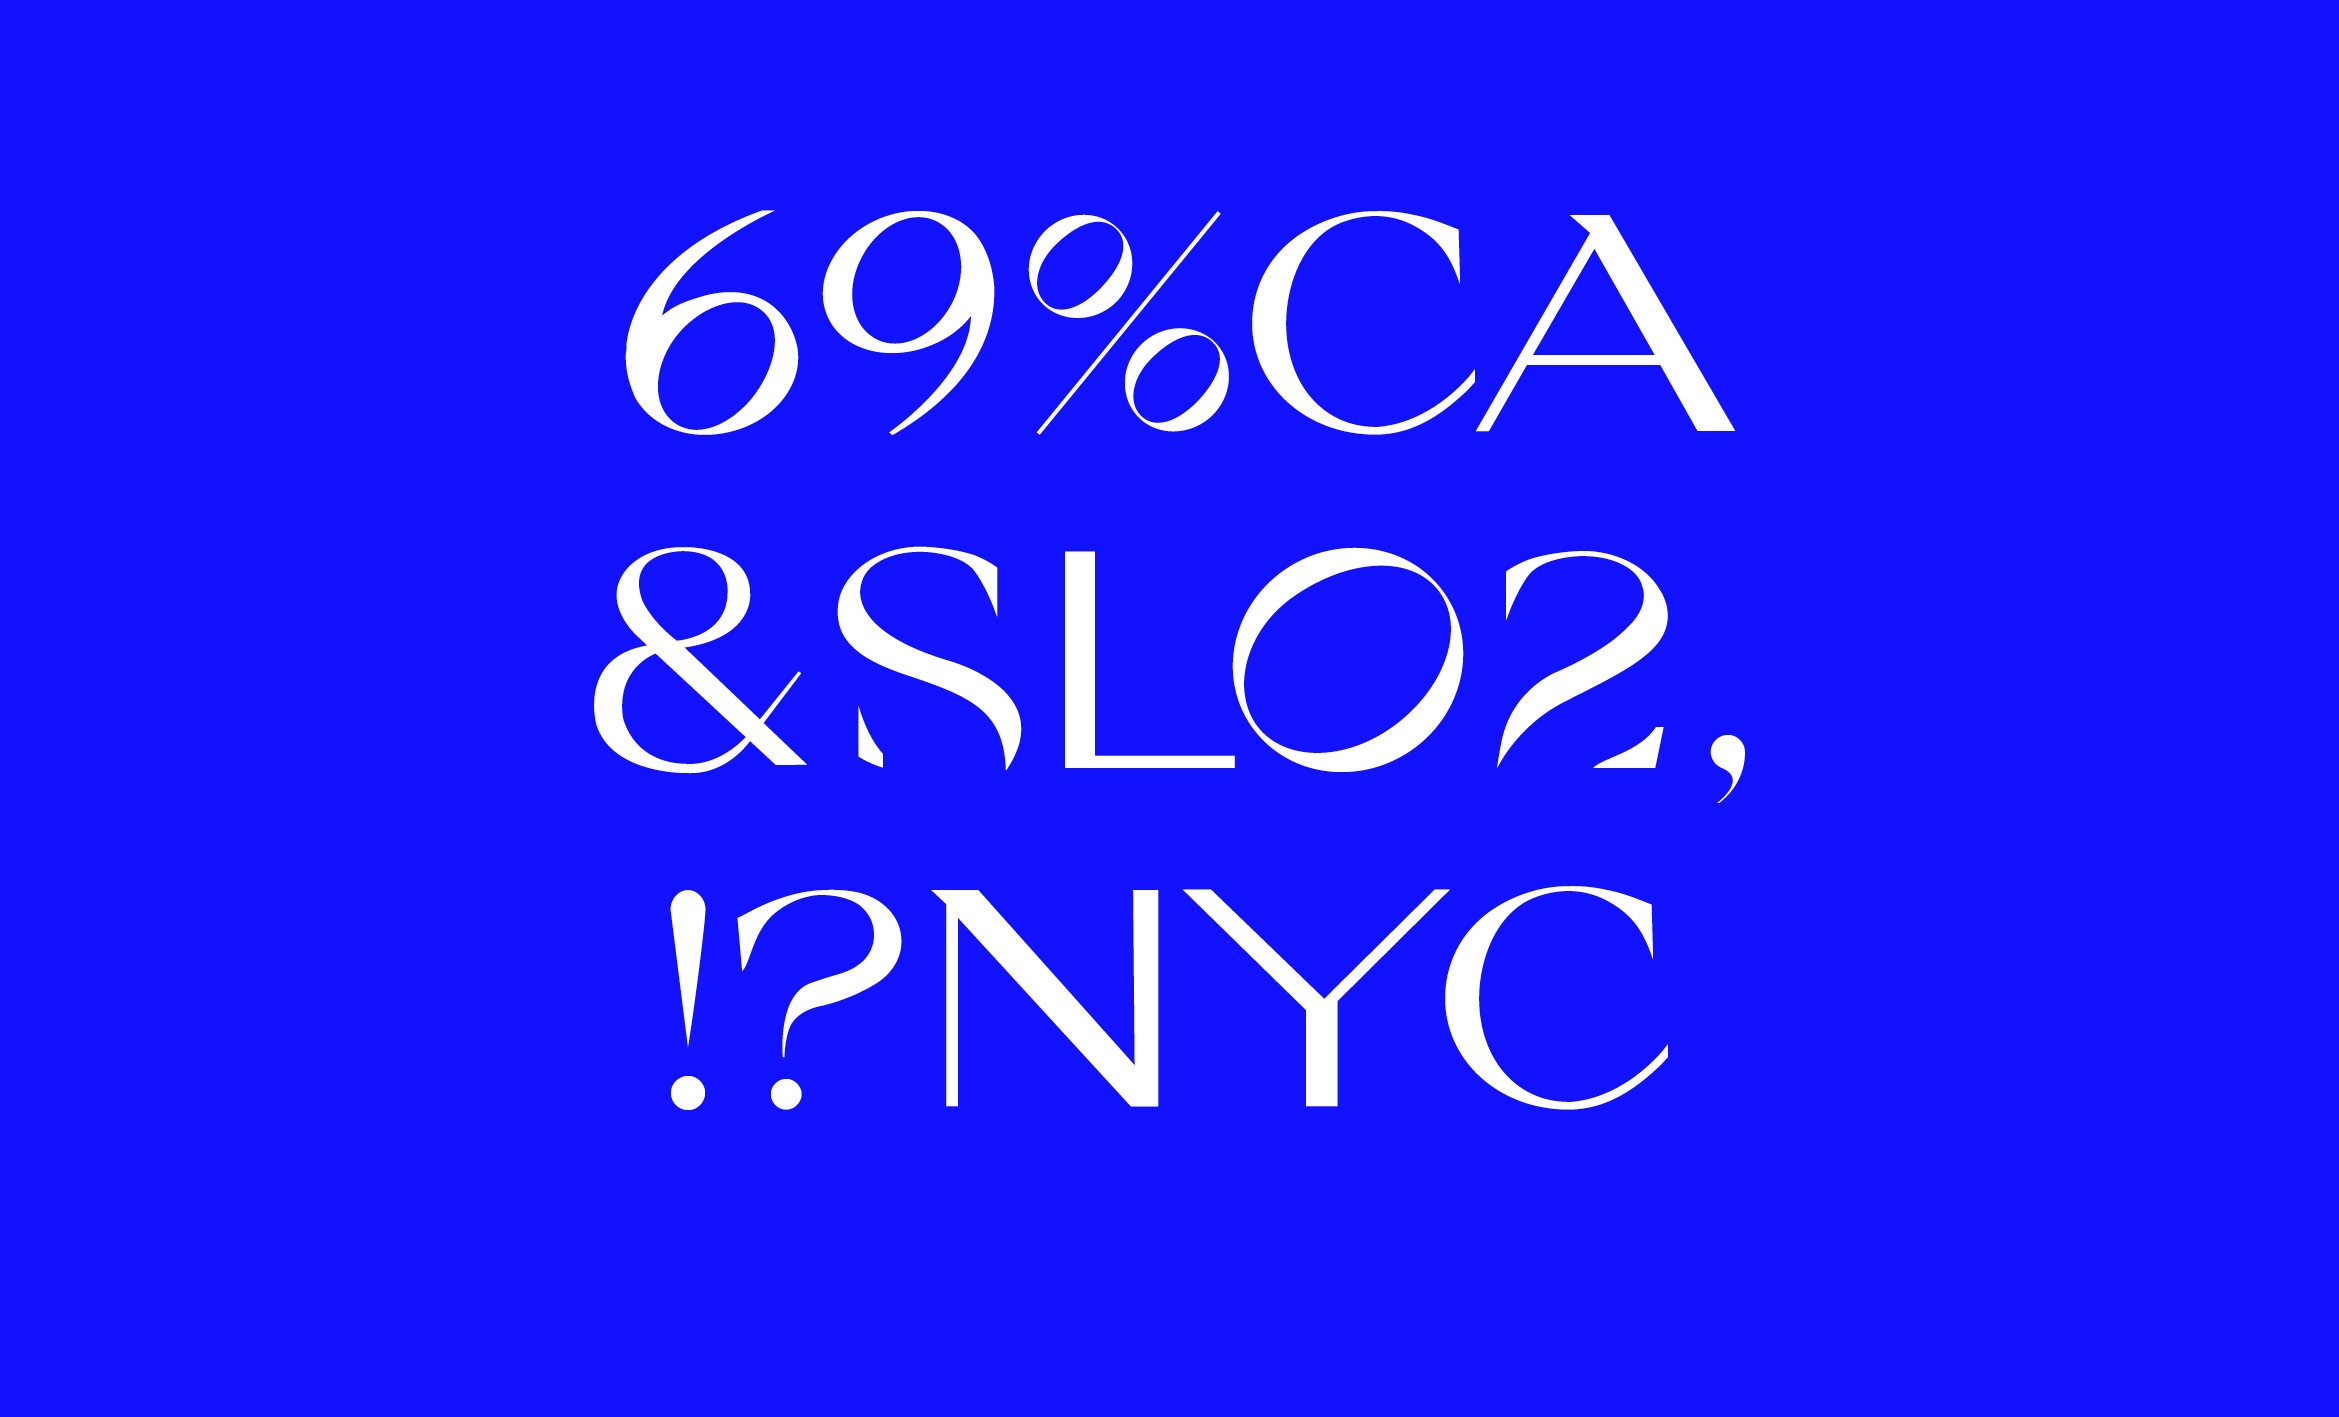 Cosi-Typeface-Nikolas-Wrobel-12